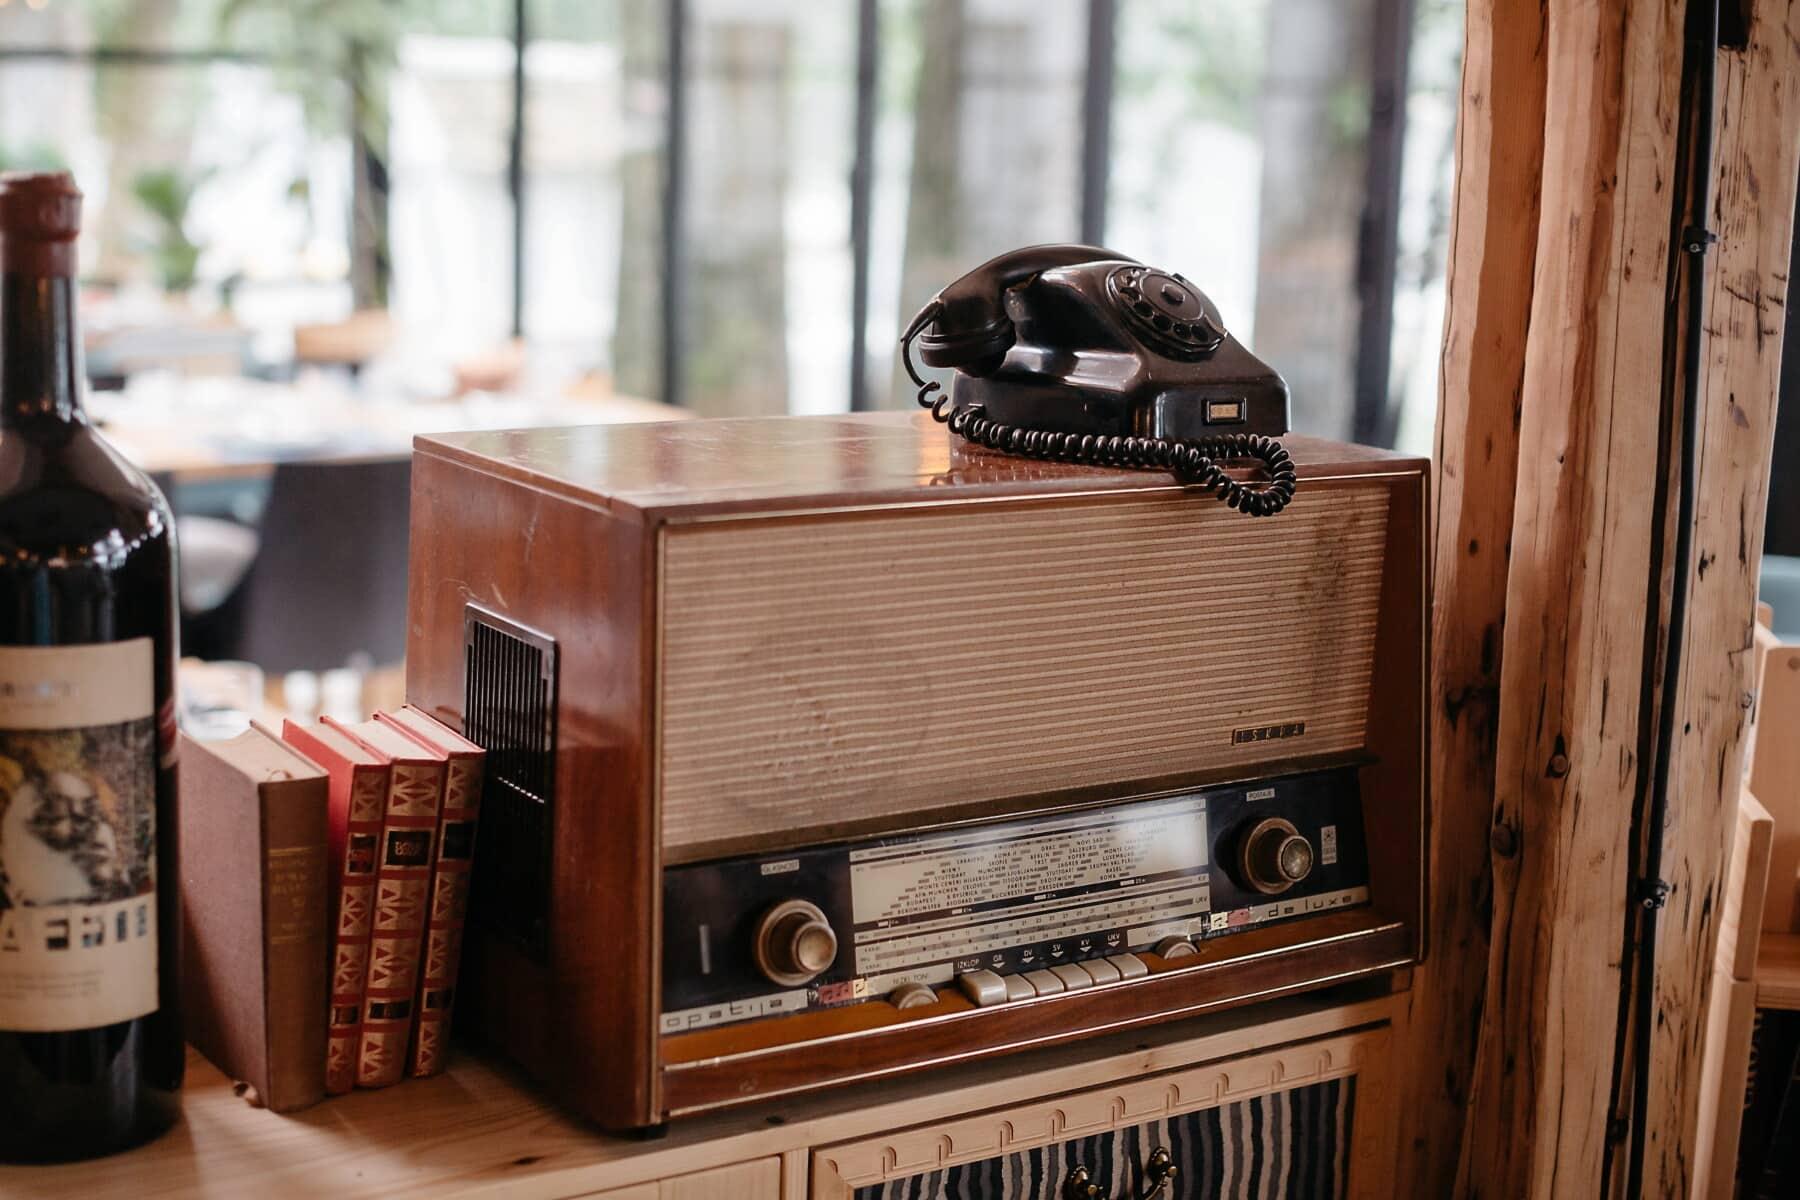 radio receiver, radio, vintage, telephone wire, telephone, nostalgia, bookshelf, wood, retro, old